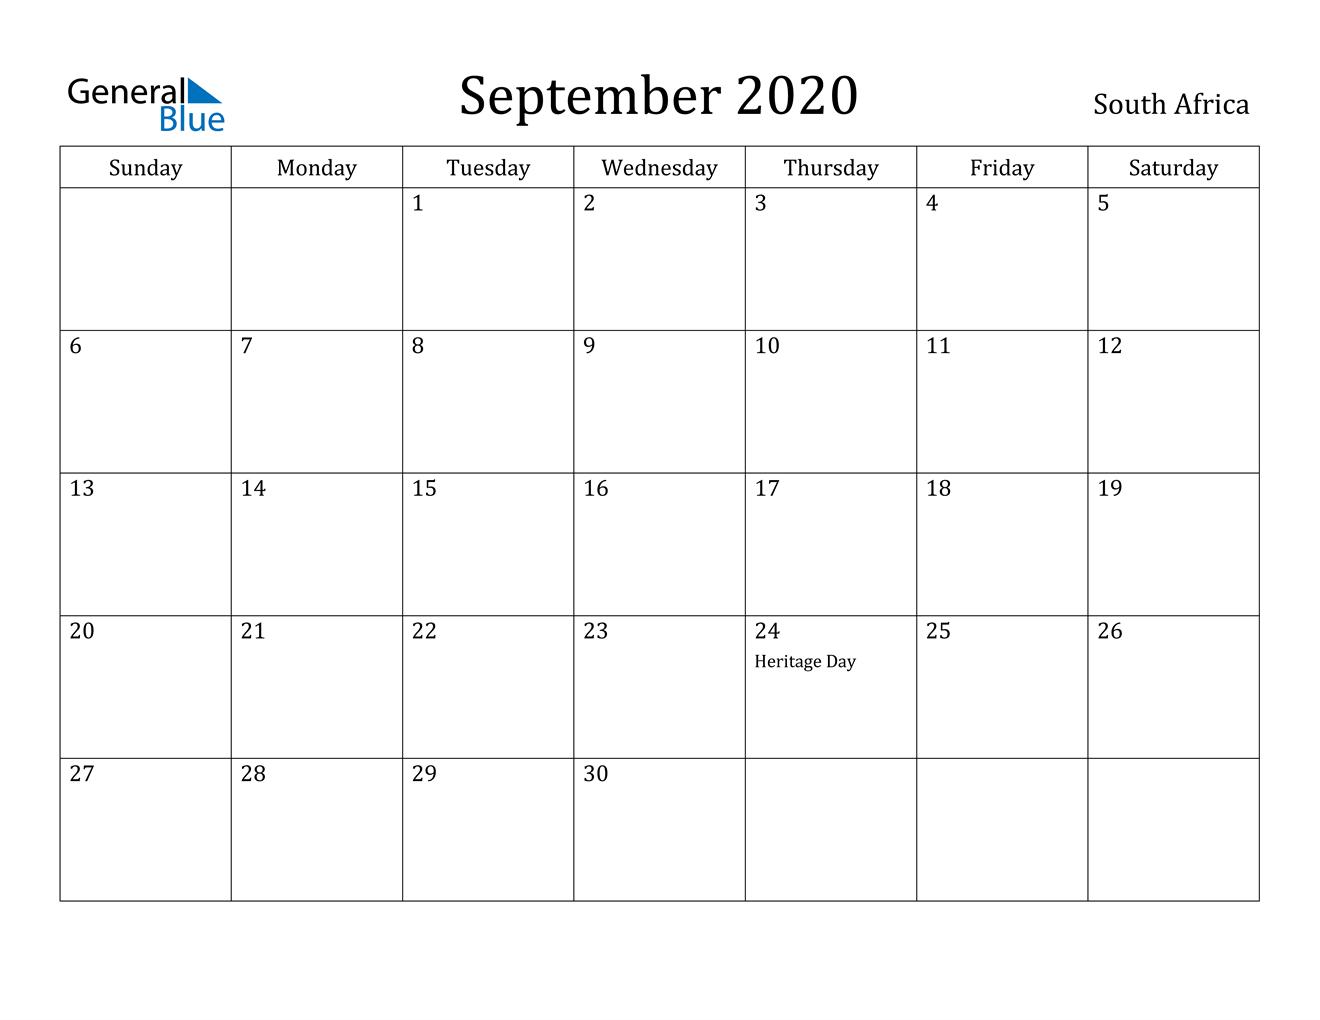 September 2020 Calendar - South Africa